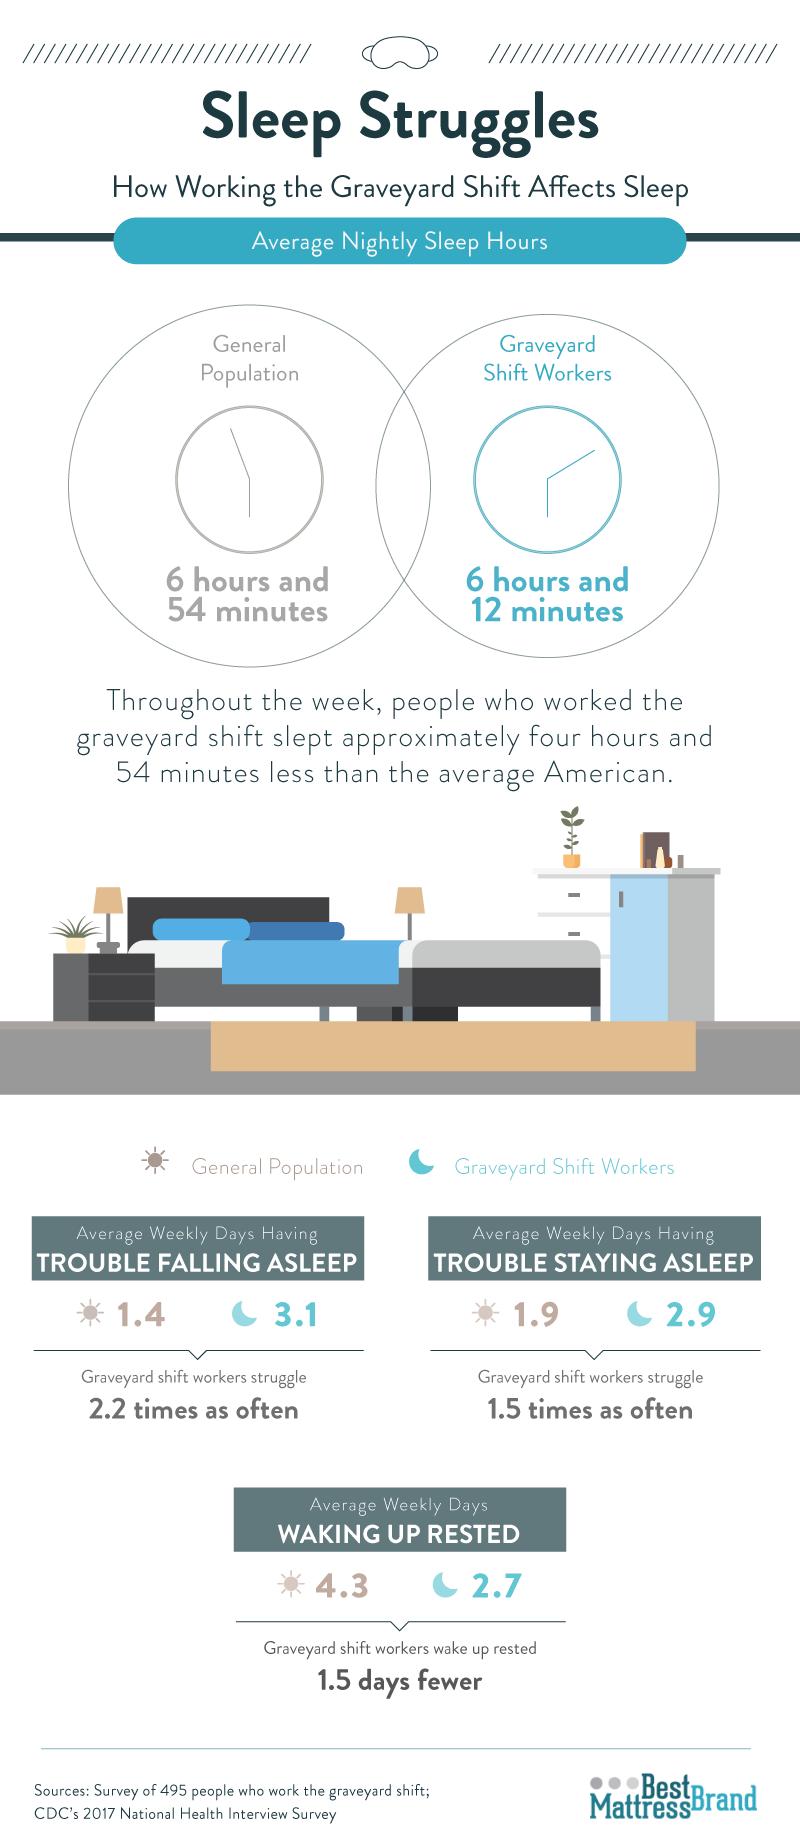 sleep-struggles-how-working-the-graveyard-shift-affects-sleep